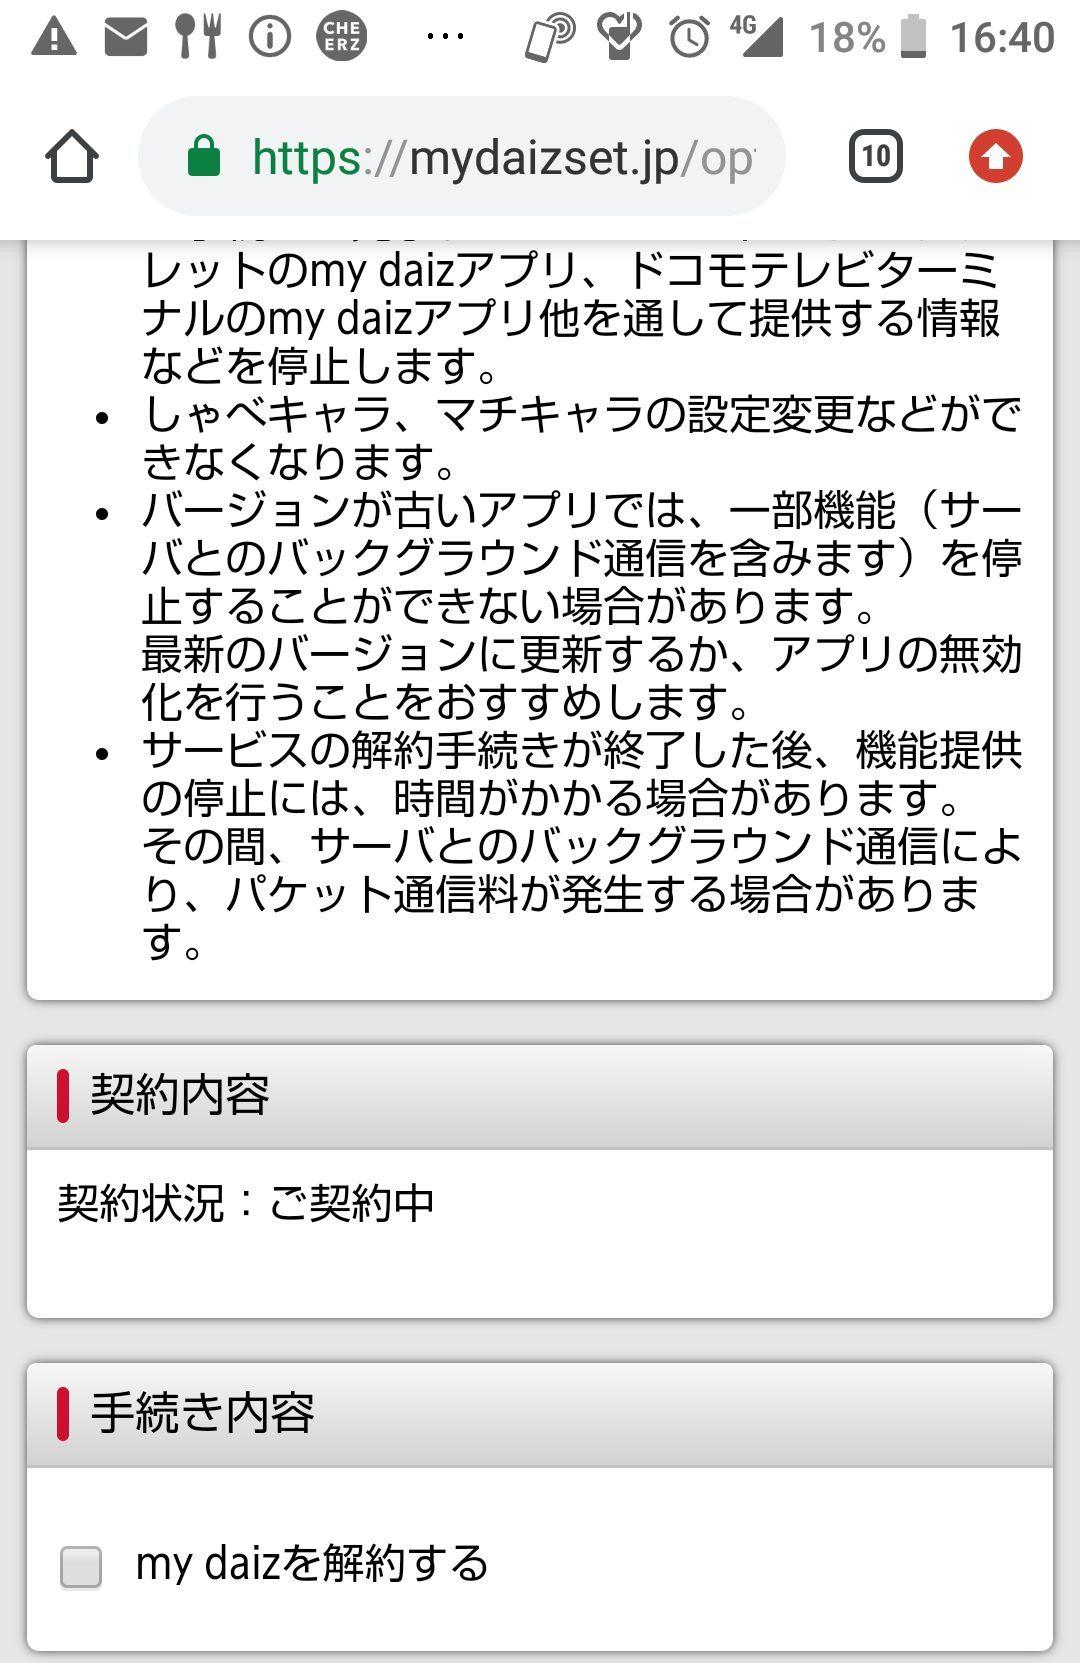 my daiz(無料サービス)解約申し込み